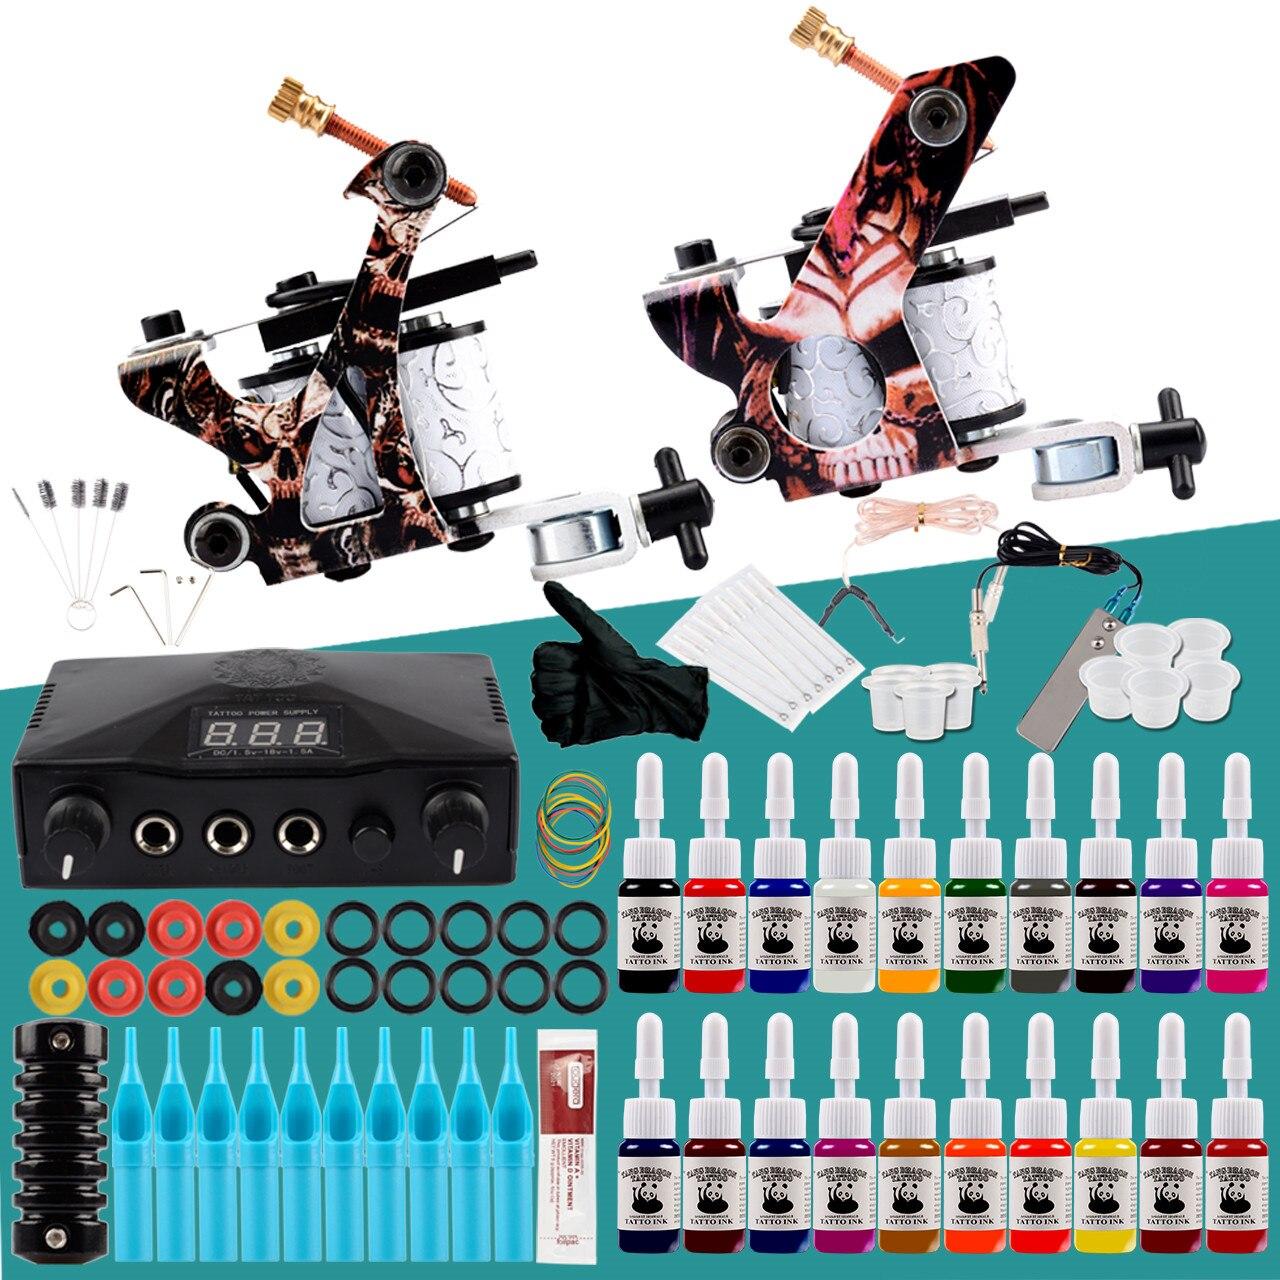 Professionelle Tattoo Kit 2 Tattoo Maschinen Set Permanent Tinten Pigment LCD Power Tattoo Ausrüstung Make-Up Kunst Komplette Tattoo Set